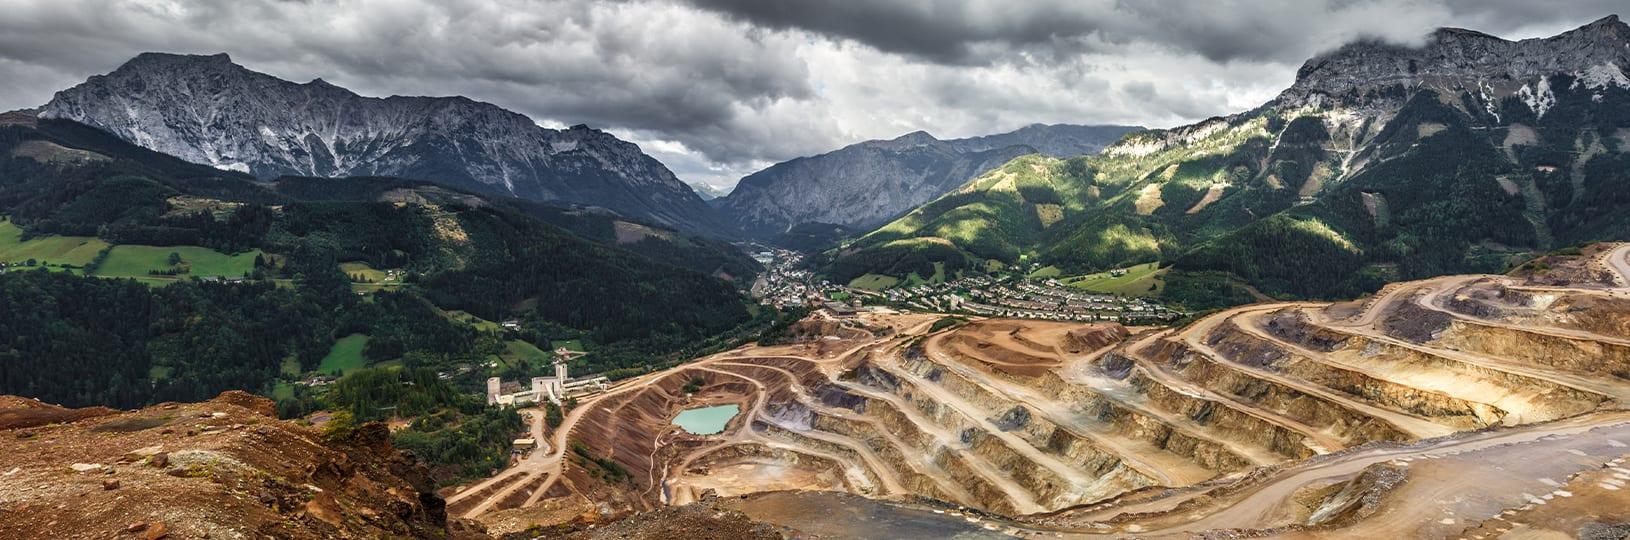 Habitat destruction from diamond mining